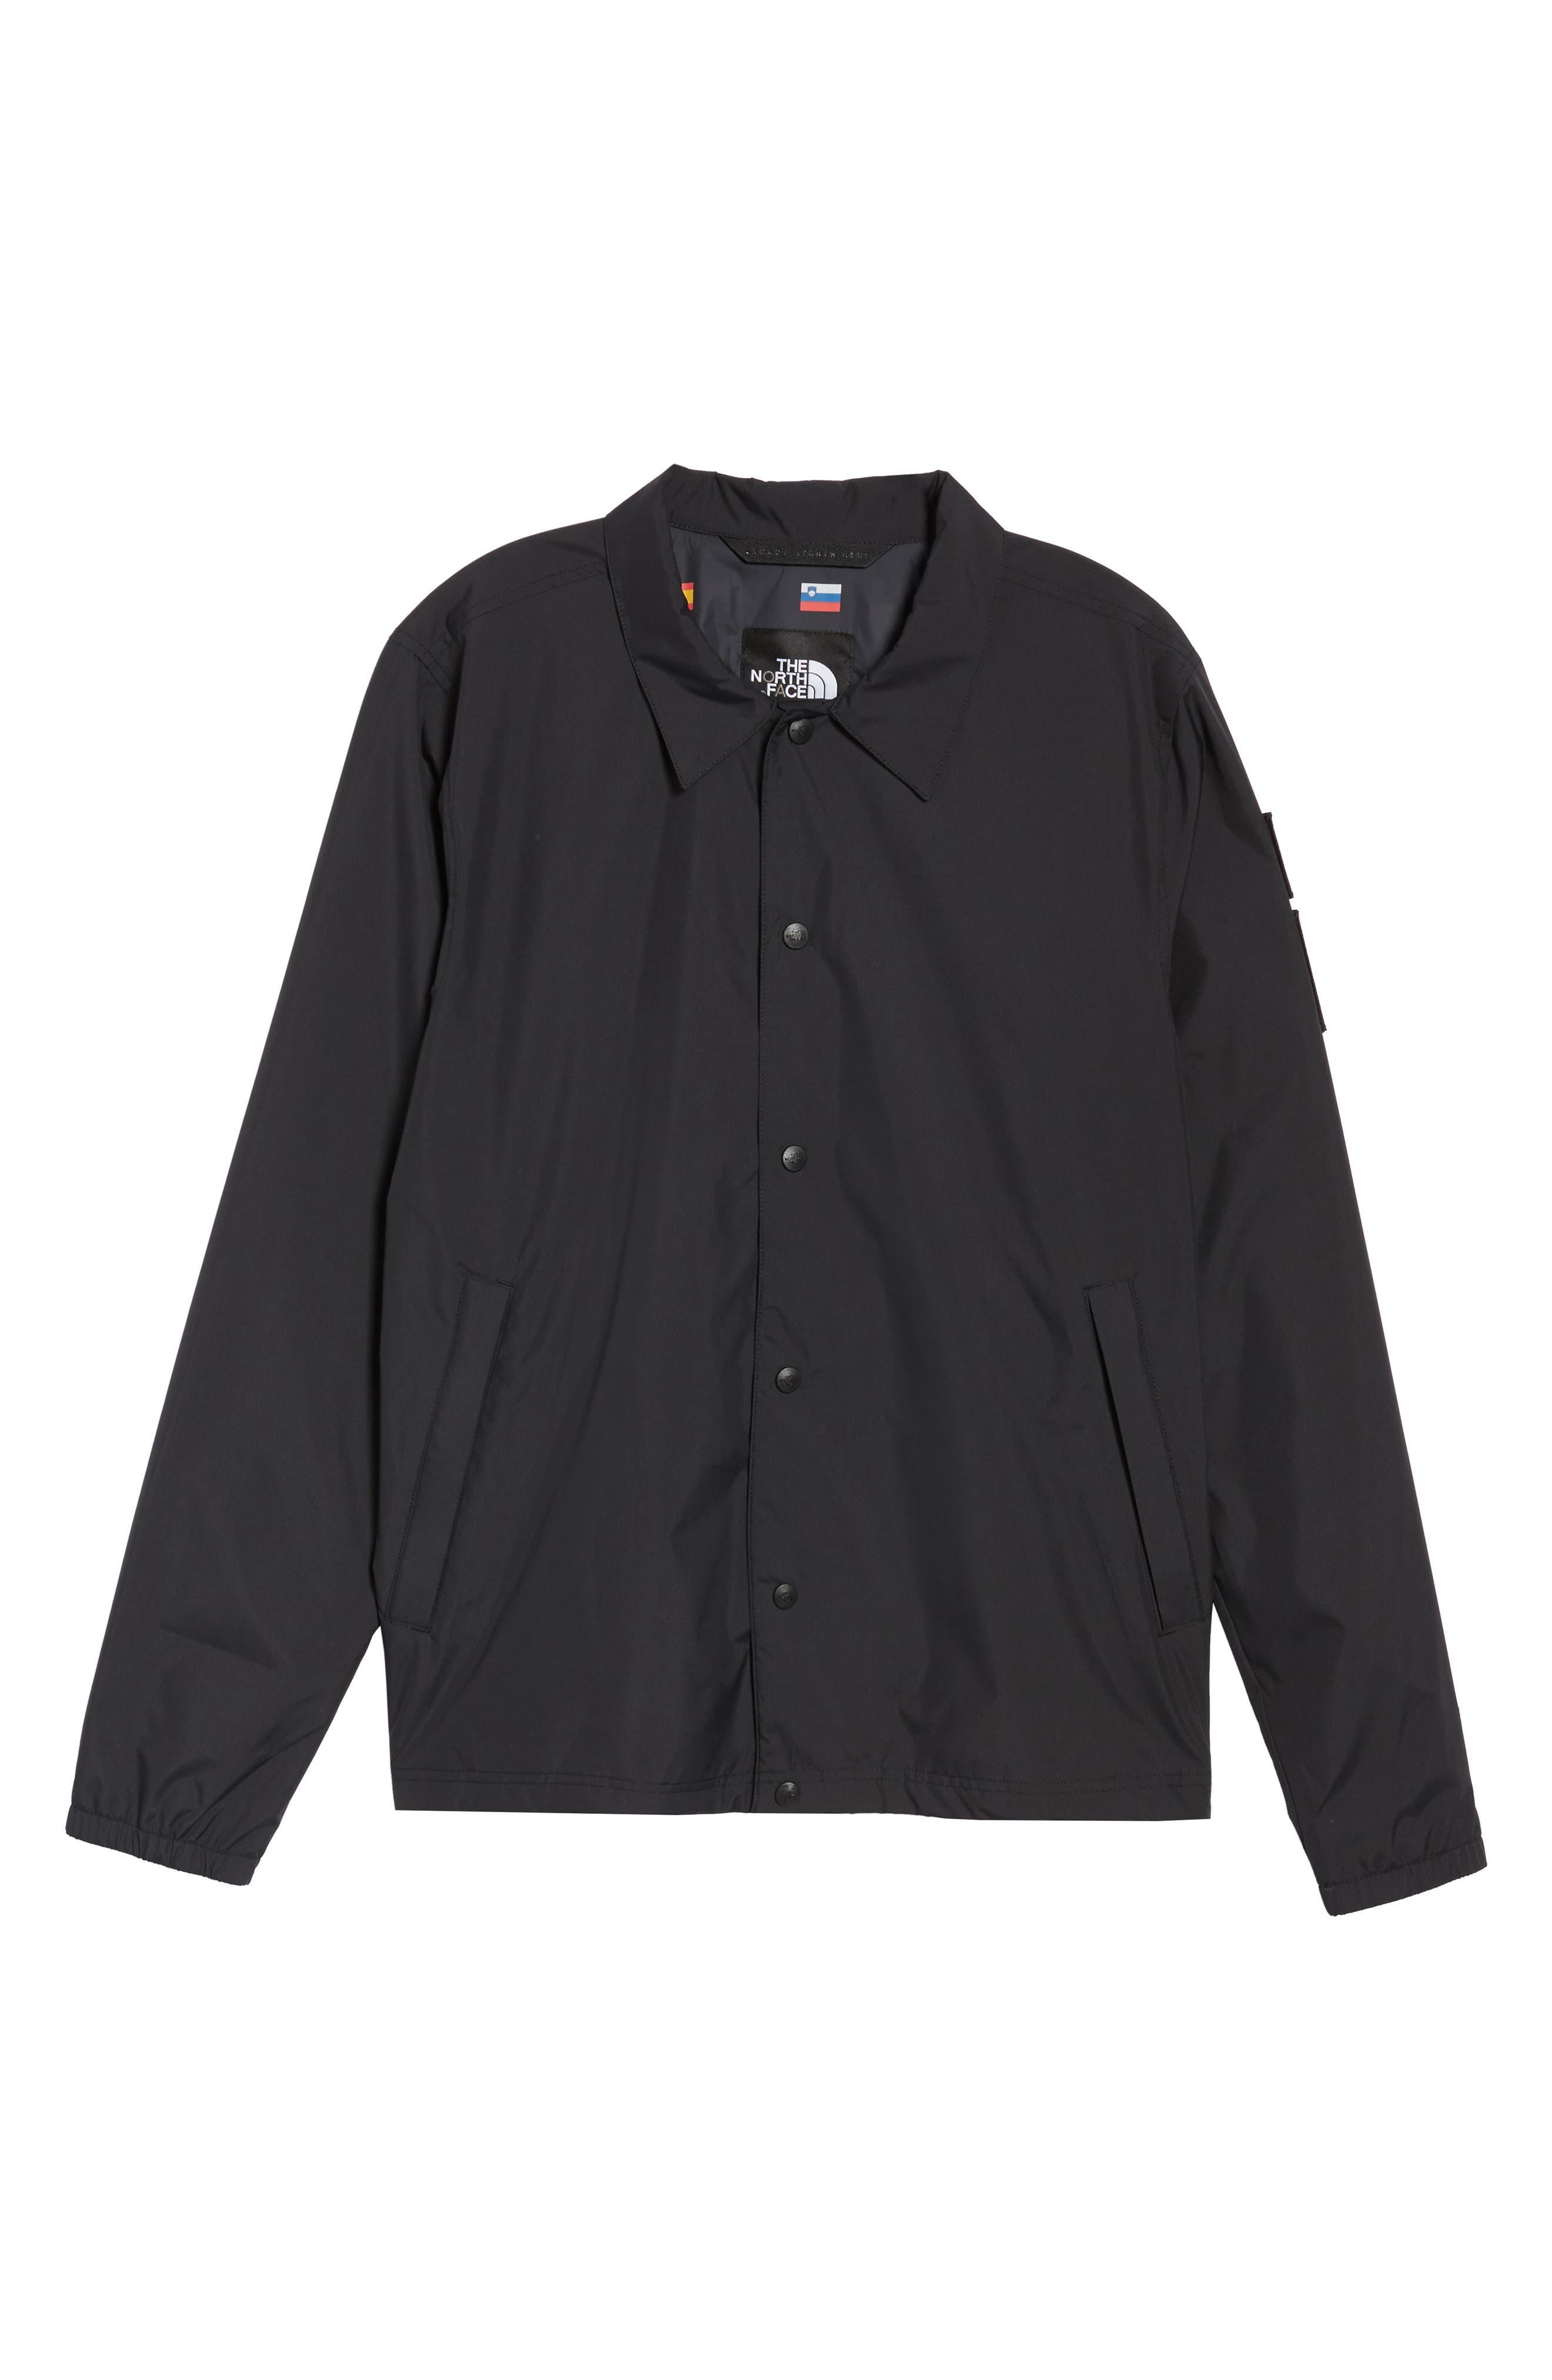 International Collection Coach Jacket,                             Alternate thumbnail 13, color,